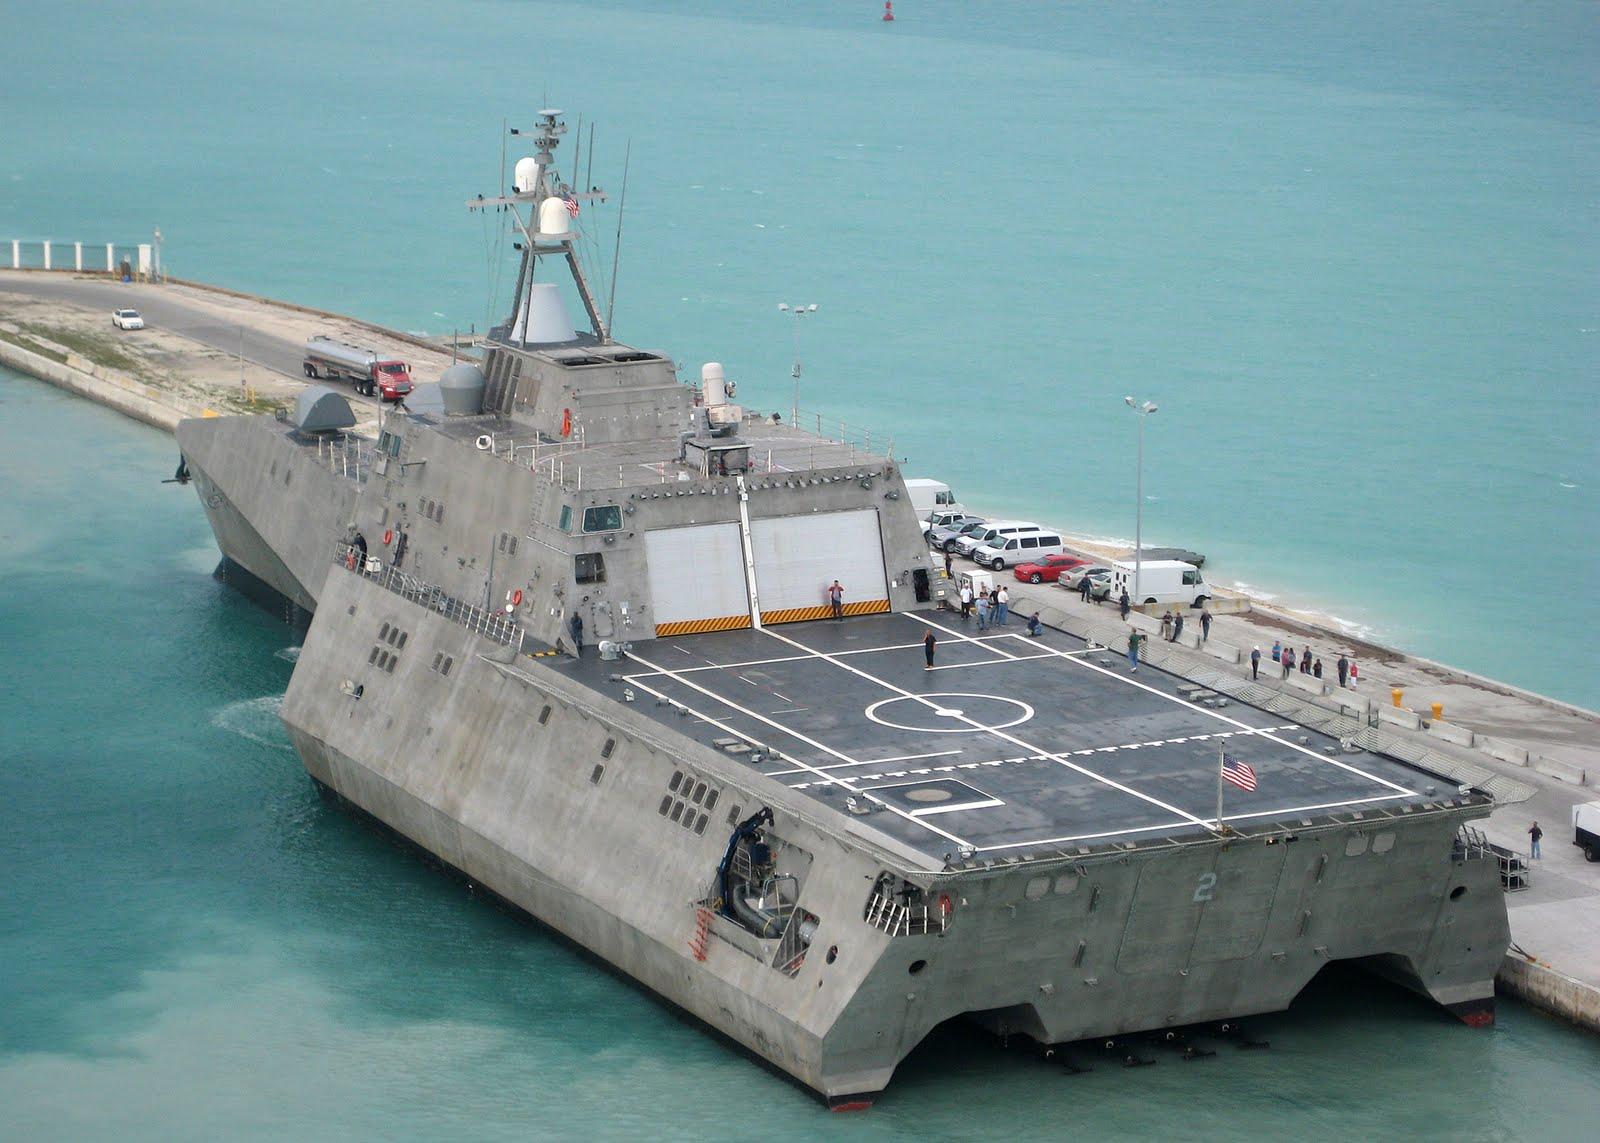 USS INDEPENDENCE LCS-2Bild: U.S. Navy